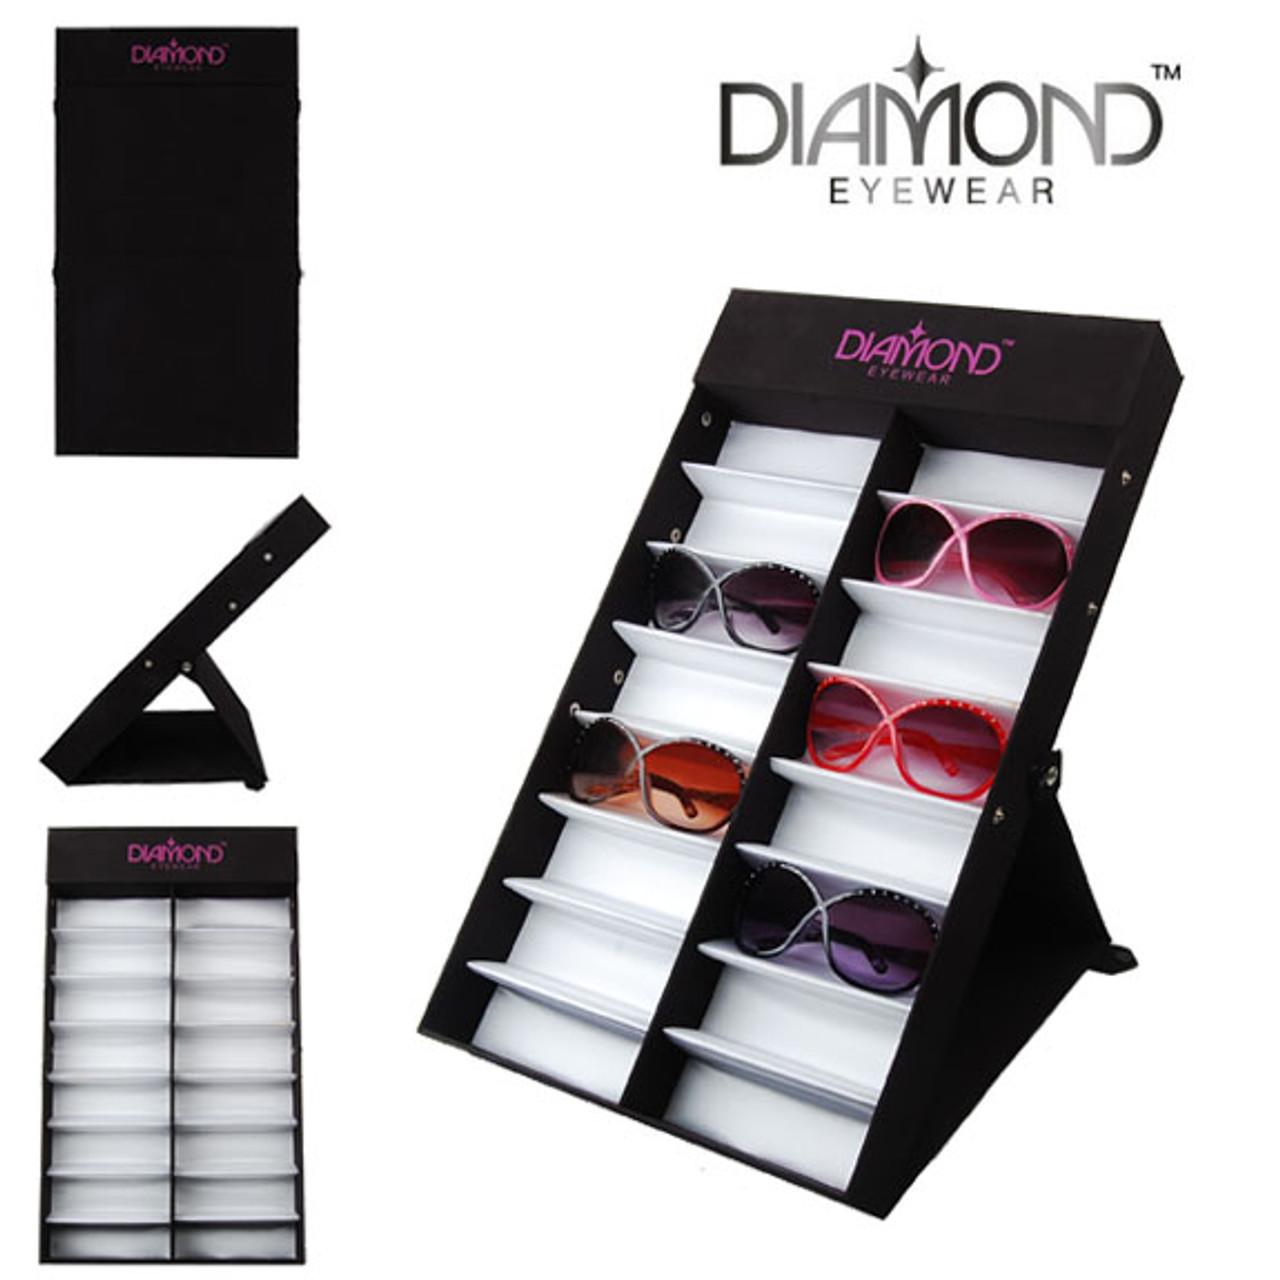 Diamond Eyewear Travel Display for Sunglasses